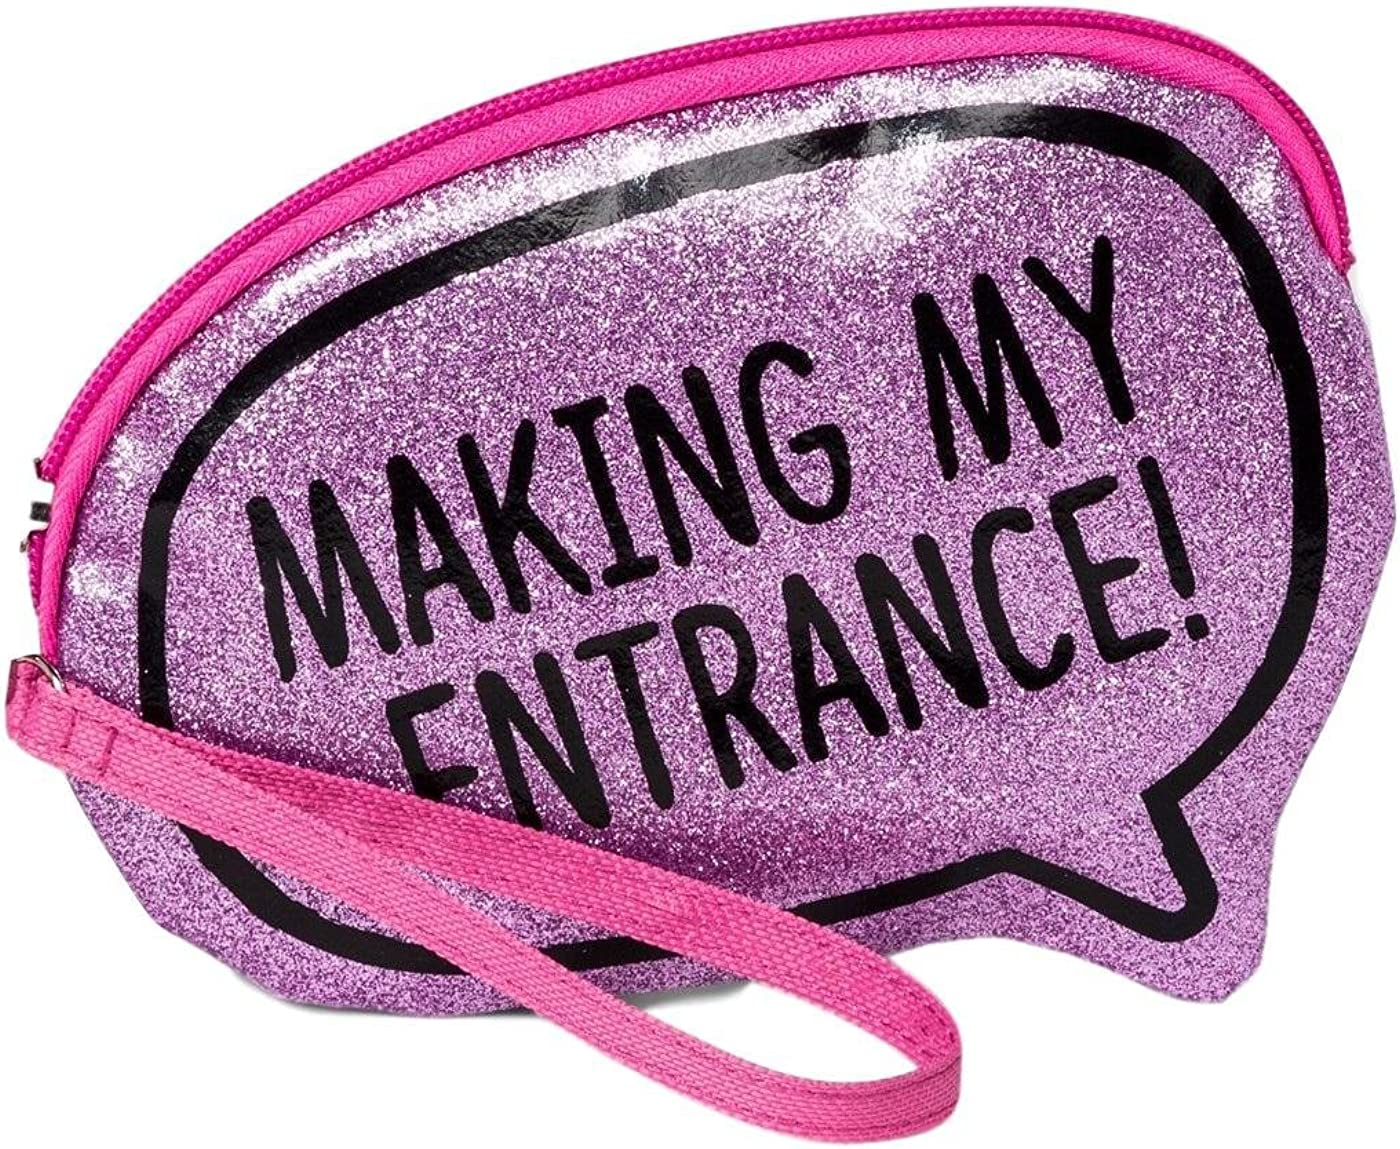 Surprise L.O.L LOL Surprise Accessory Invotions Purse Wristlet Girls Glittery Shimmer